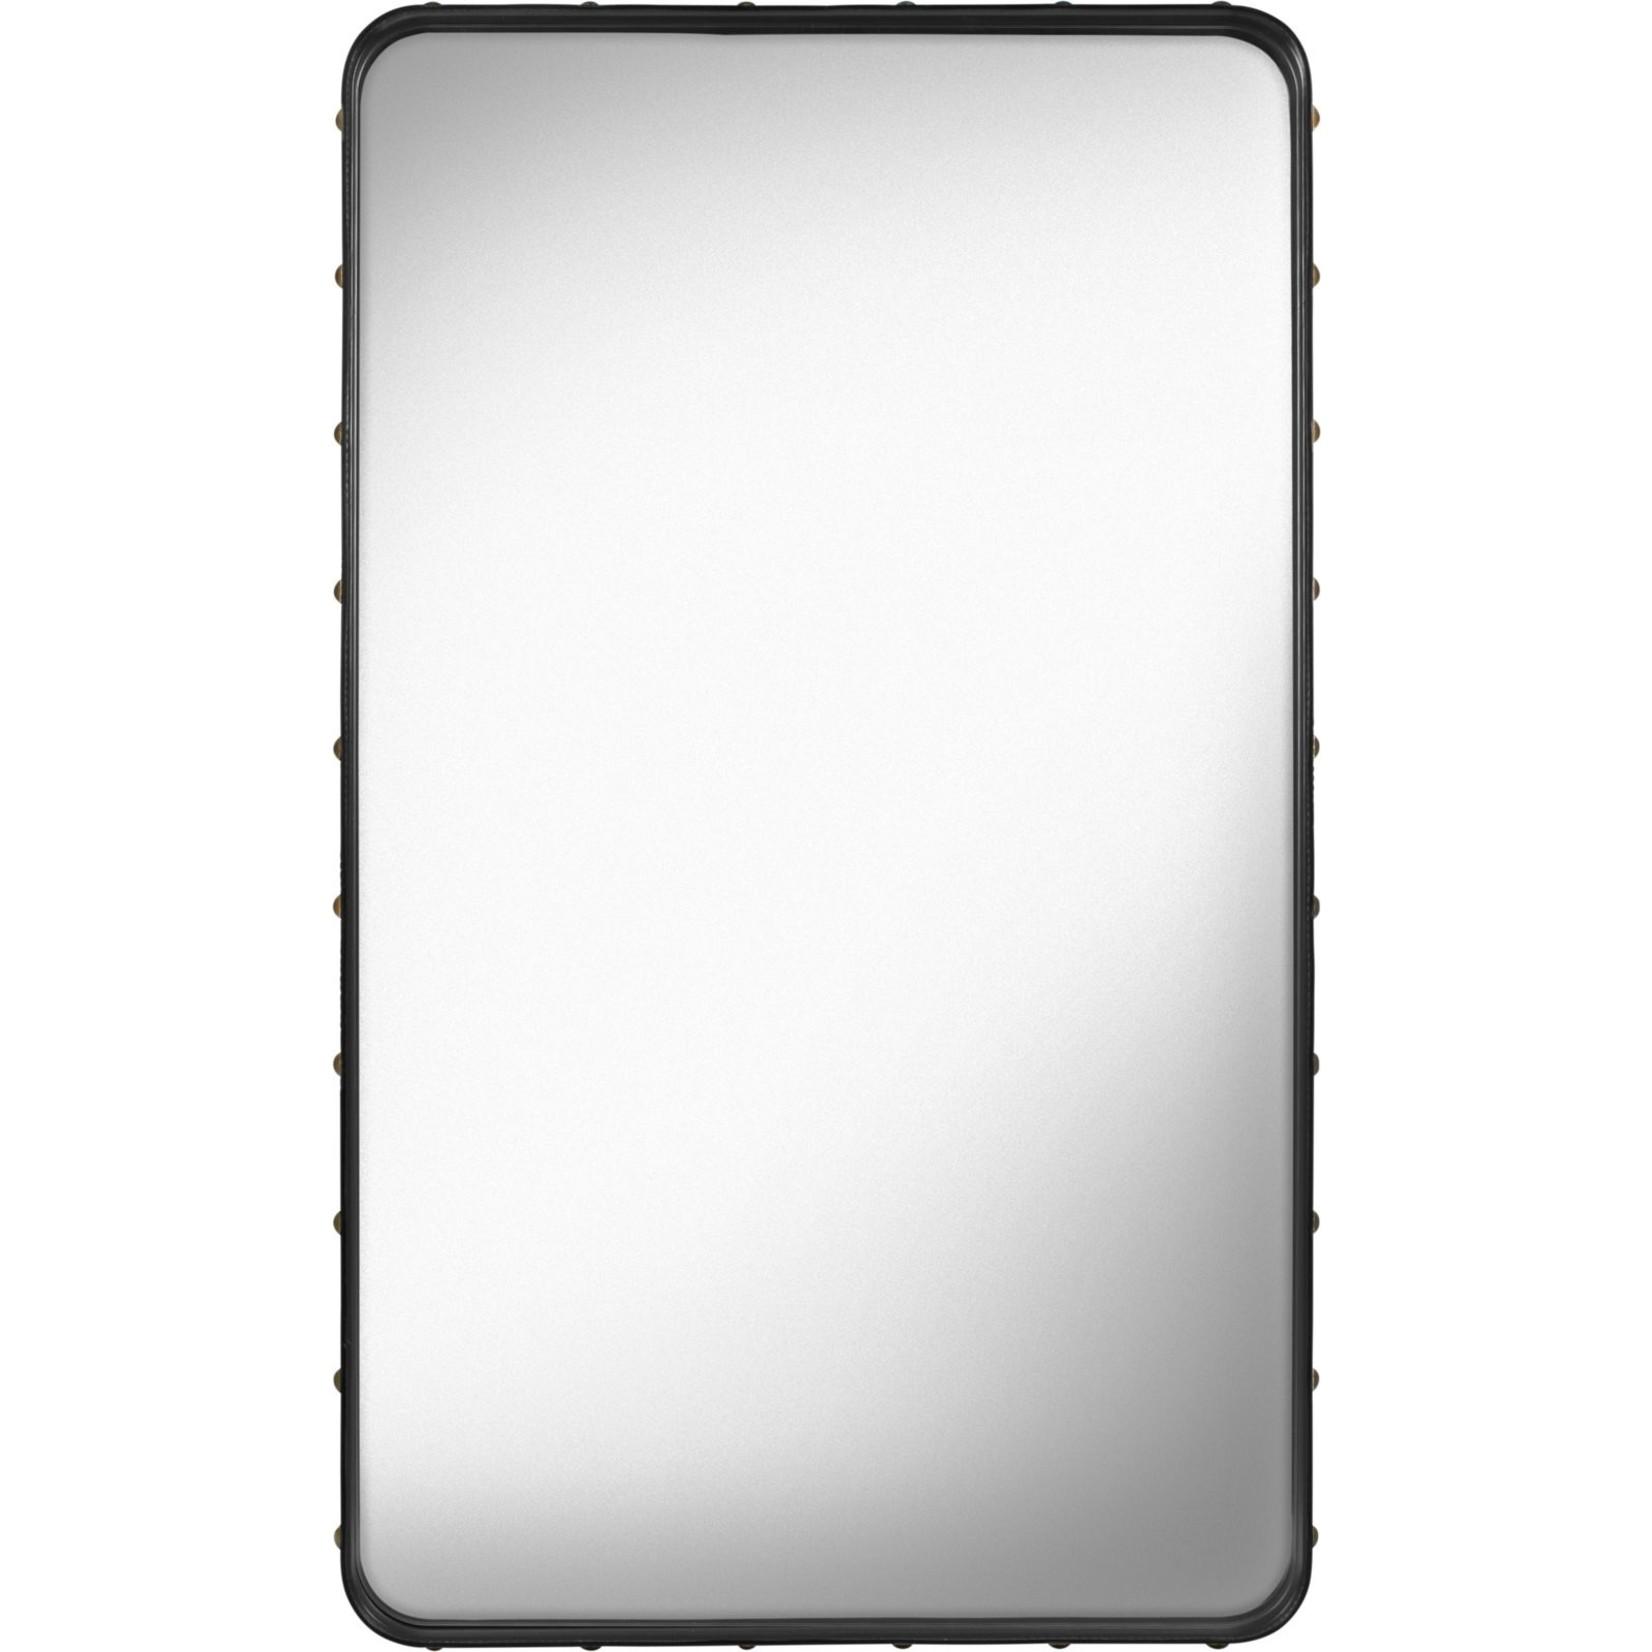 Gubi Wandspiegel Adnet - Rechthoekig - 65x115 - Black Leather